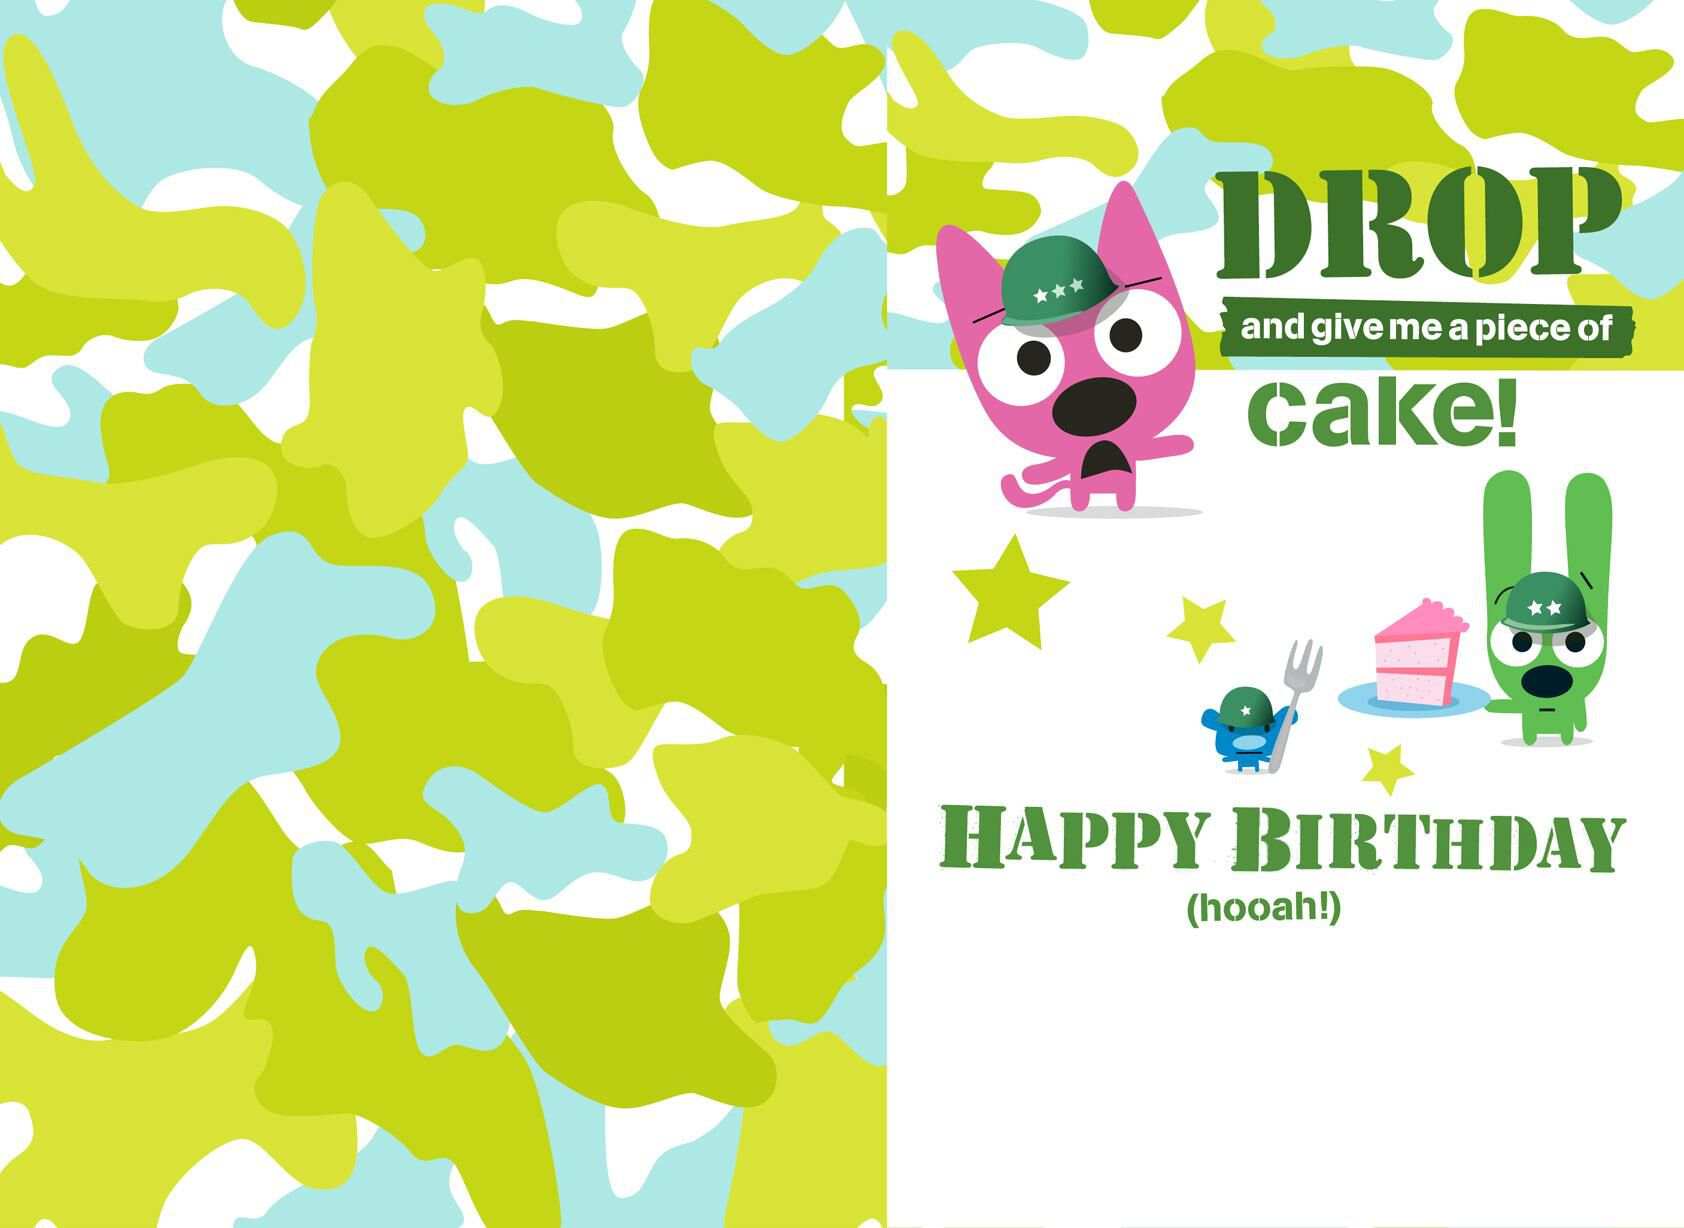 Hoopsyoyo Boot Camp Birthday Card With Sound Greeting